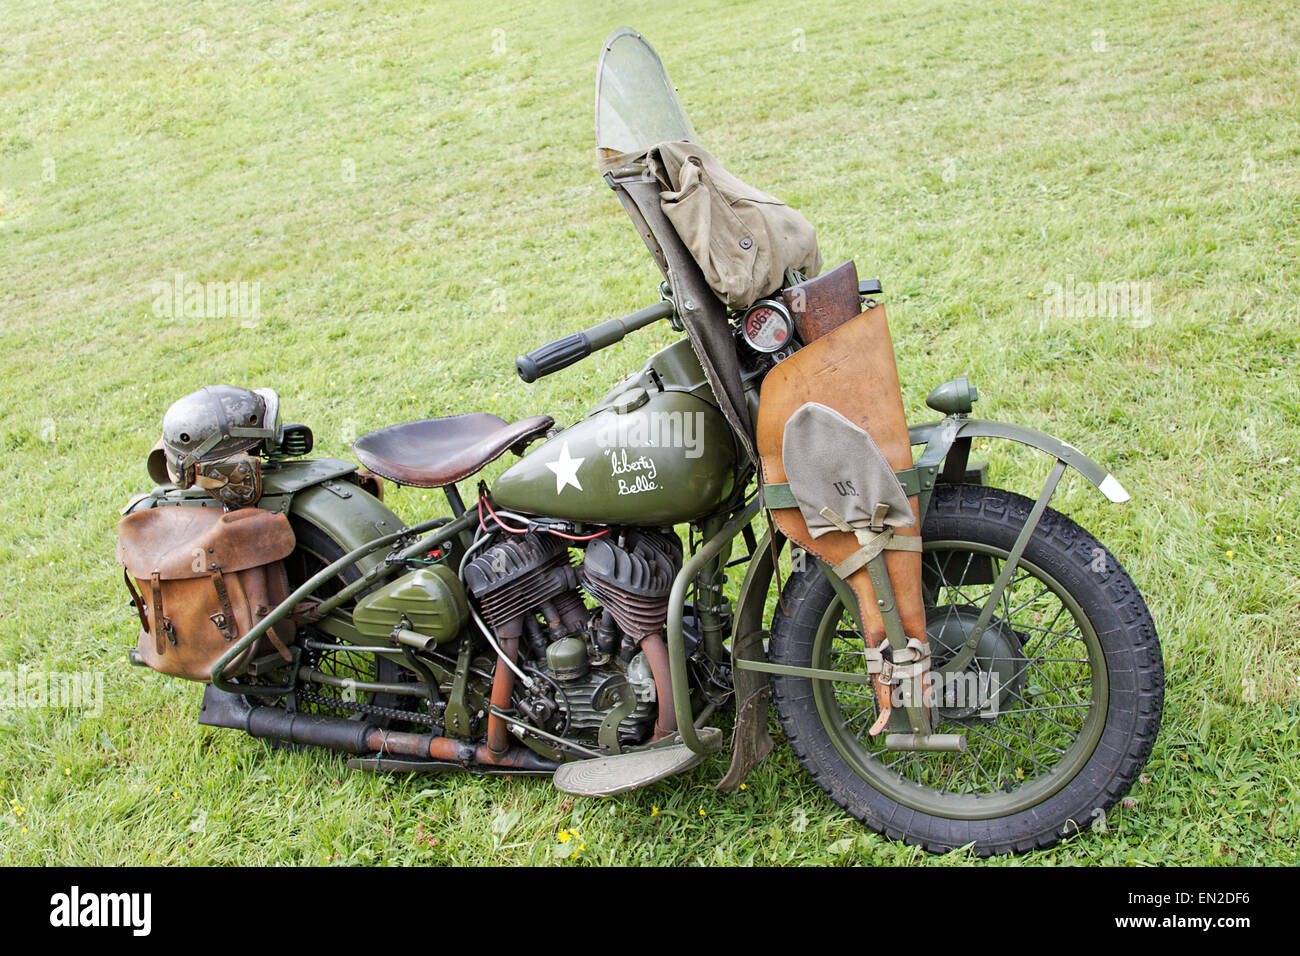 US Army Harley Davidson Motorcycle WLA Liberty Belle 9 (showing UK